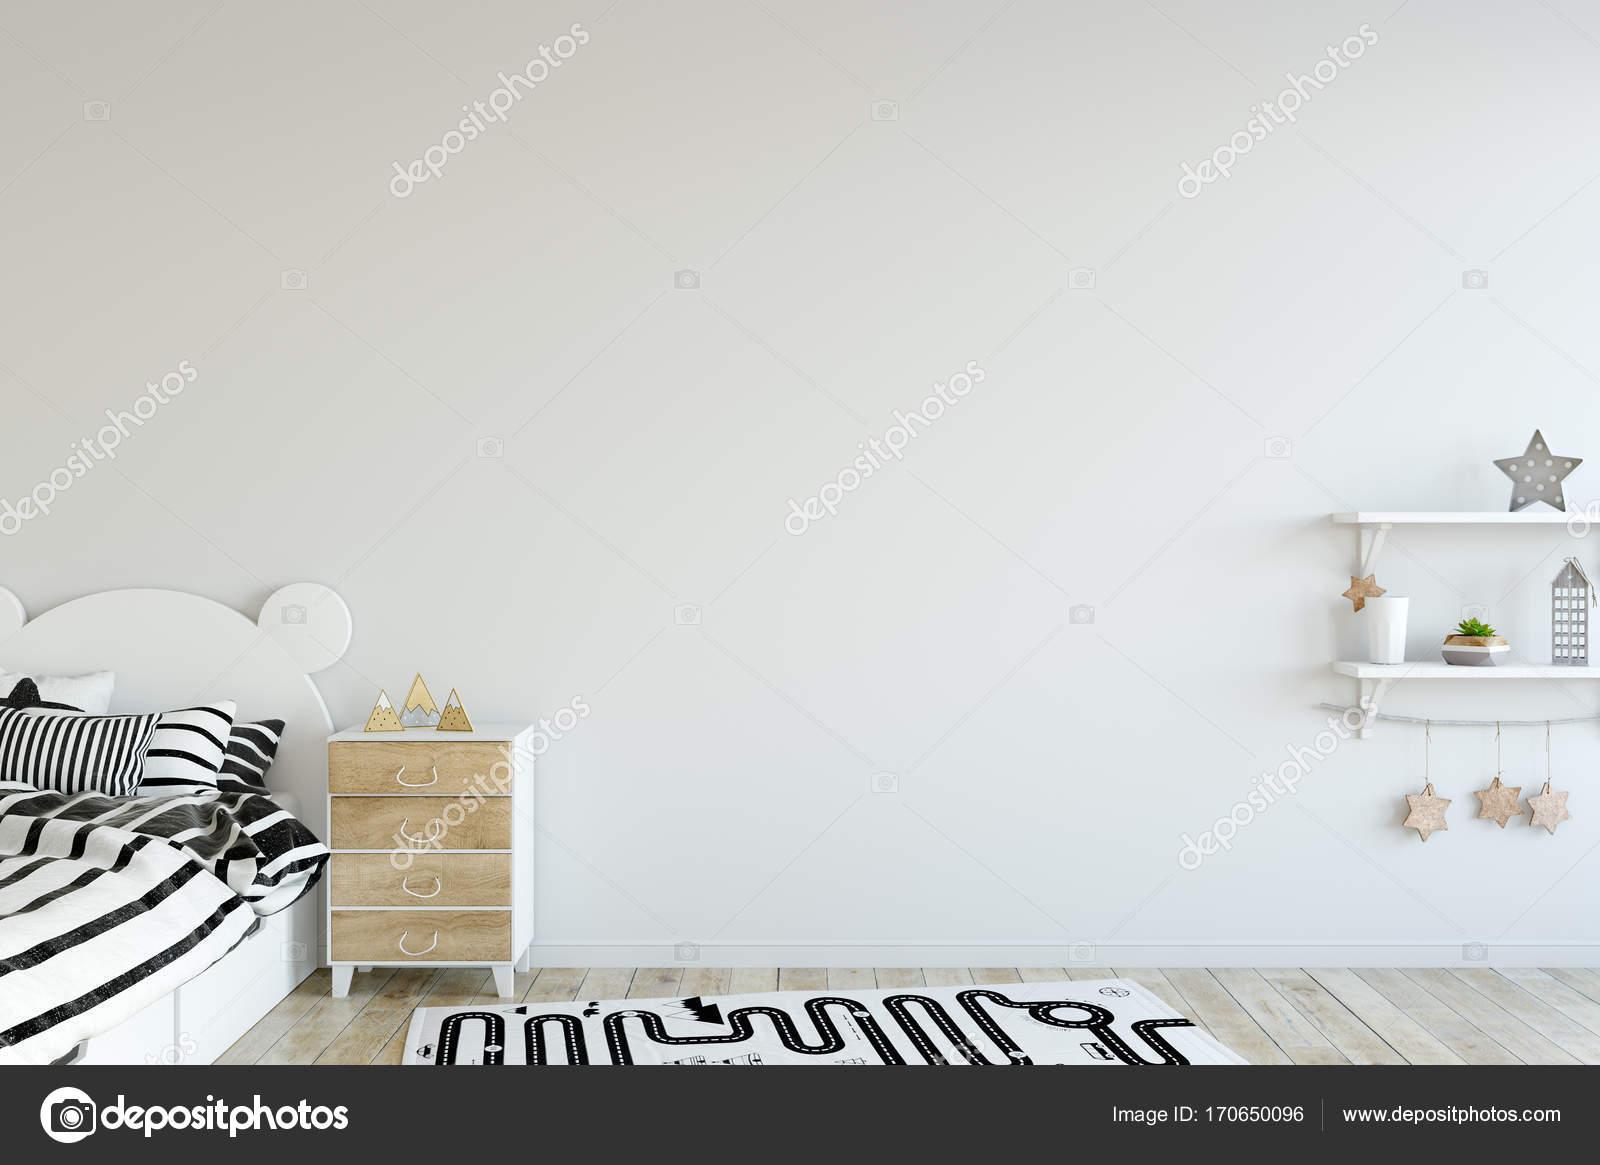 Exterior: Mock Up Wall In Child Room Interior. Interior Scandinavian